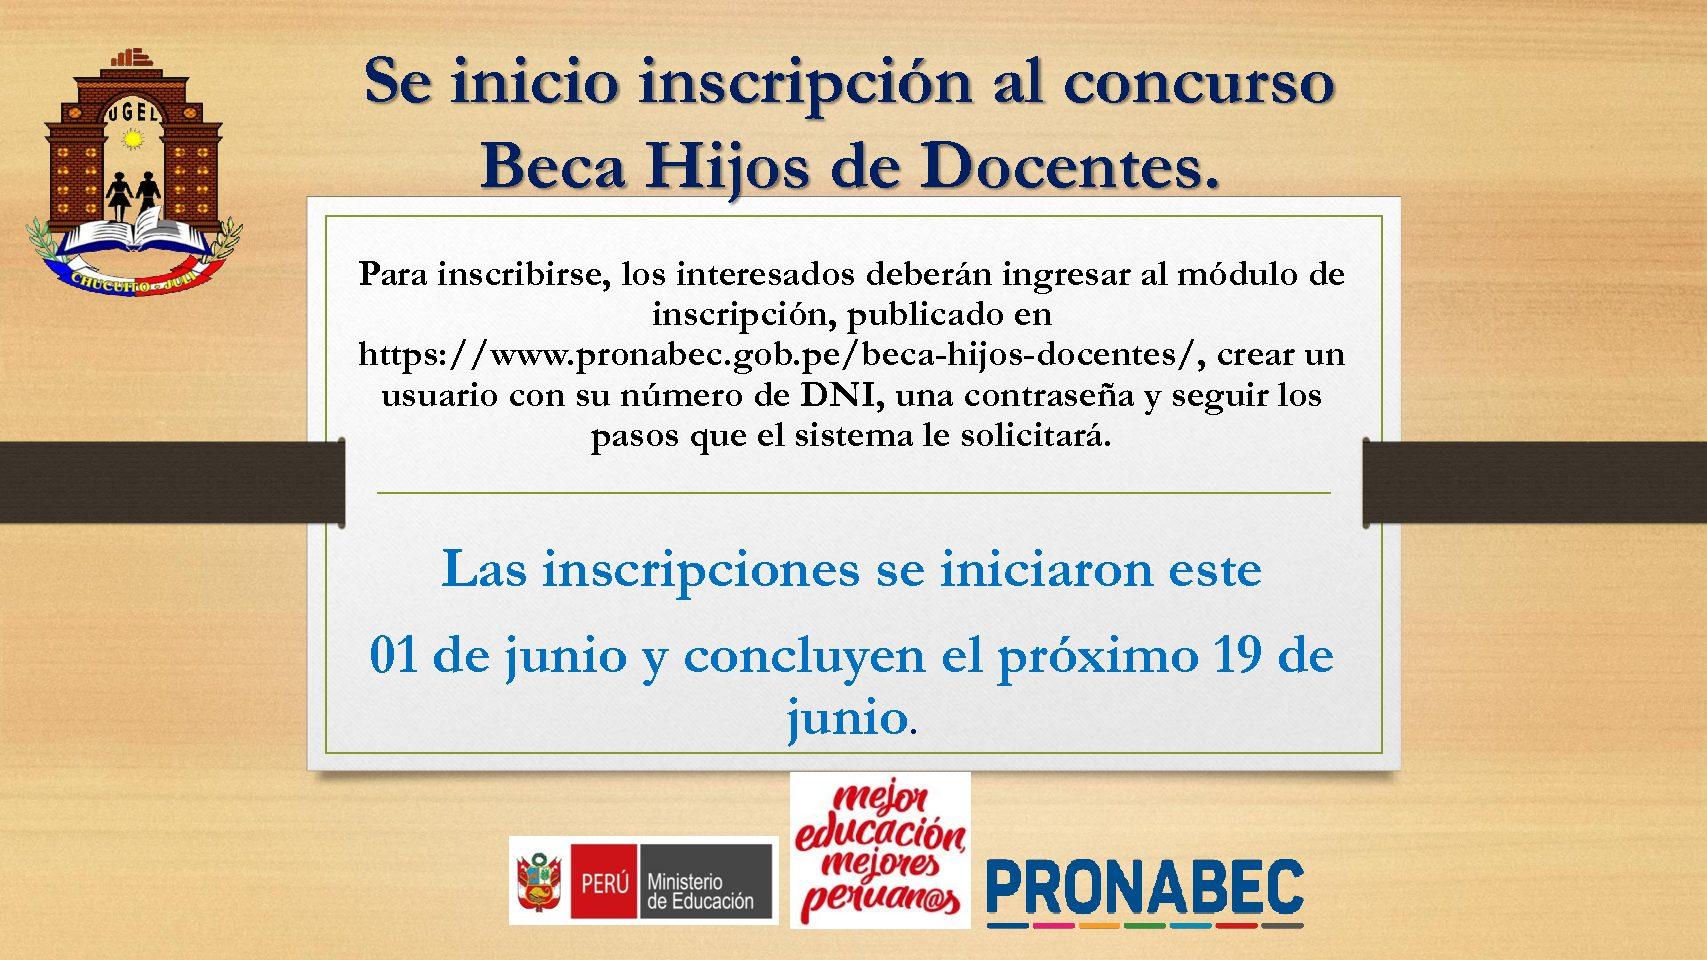 PRONABEC- INSCRIPCIONES DEL 01 AL 19 DE JUNIO